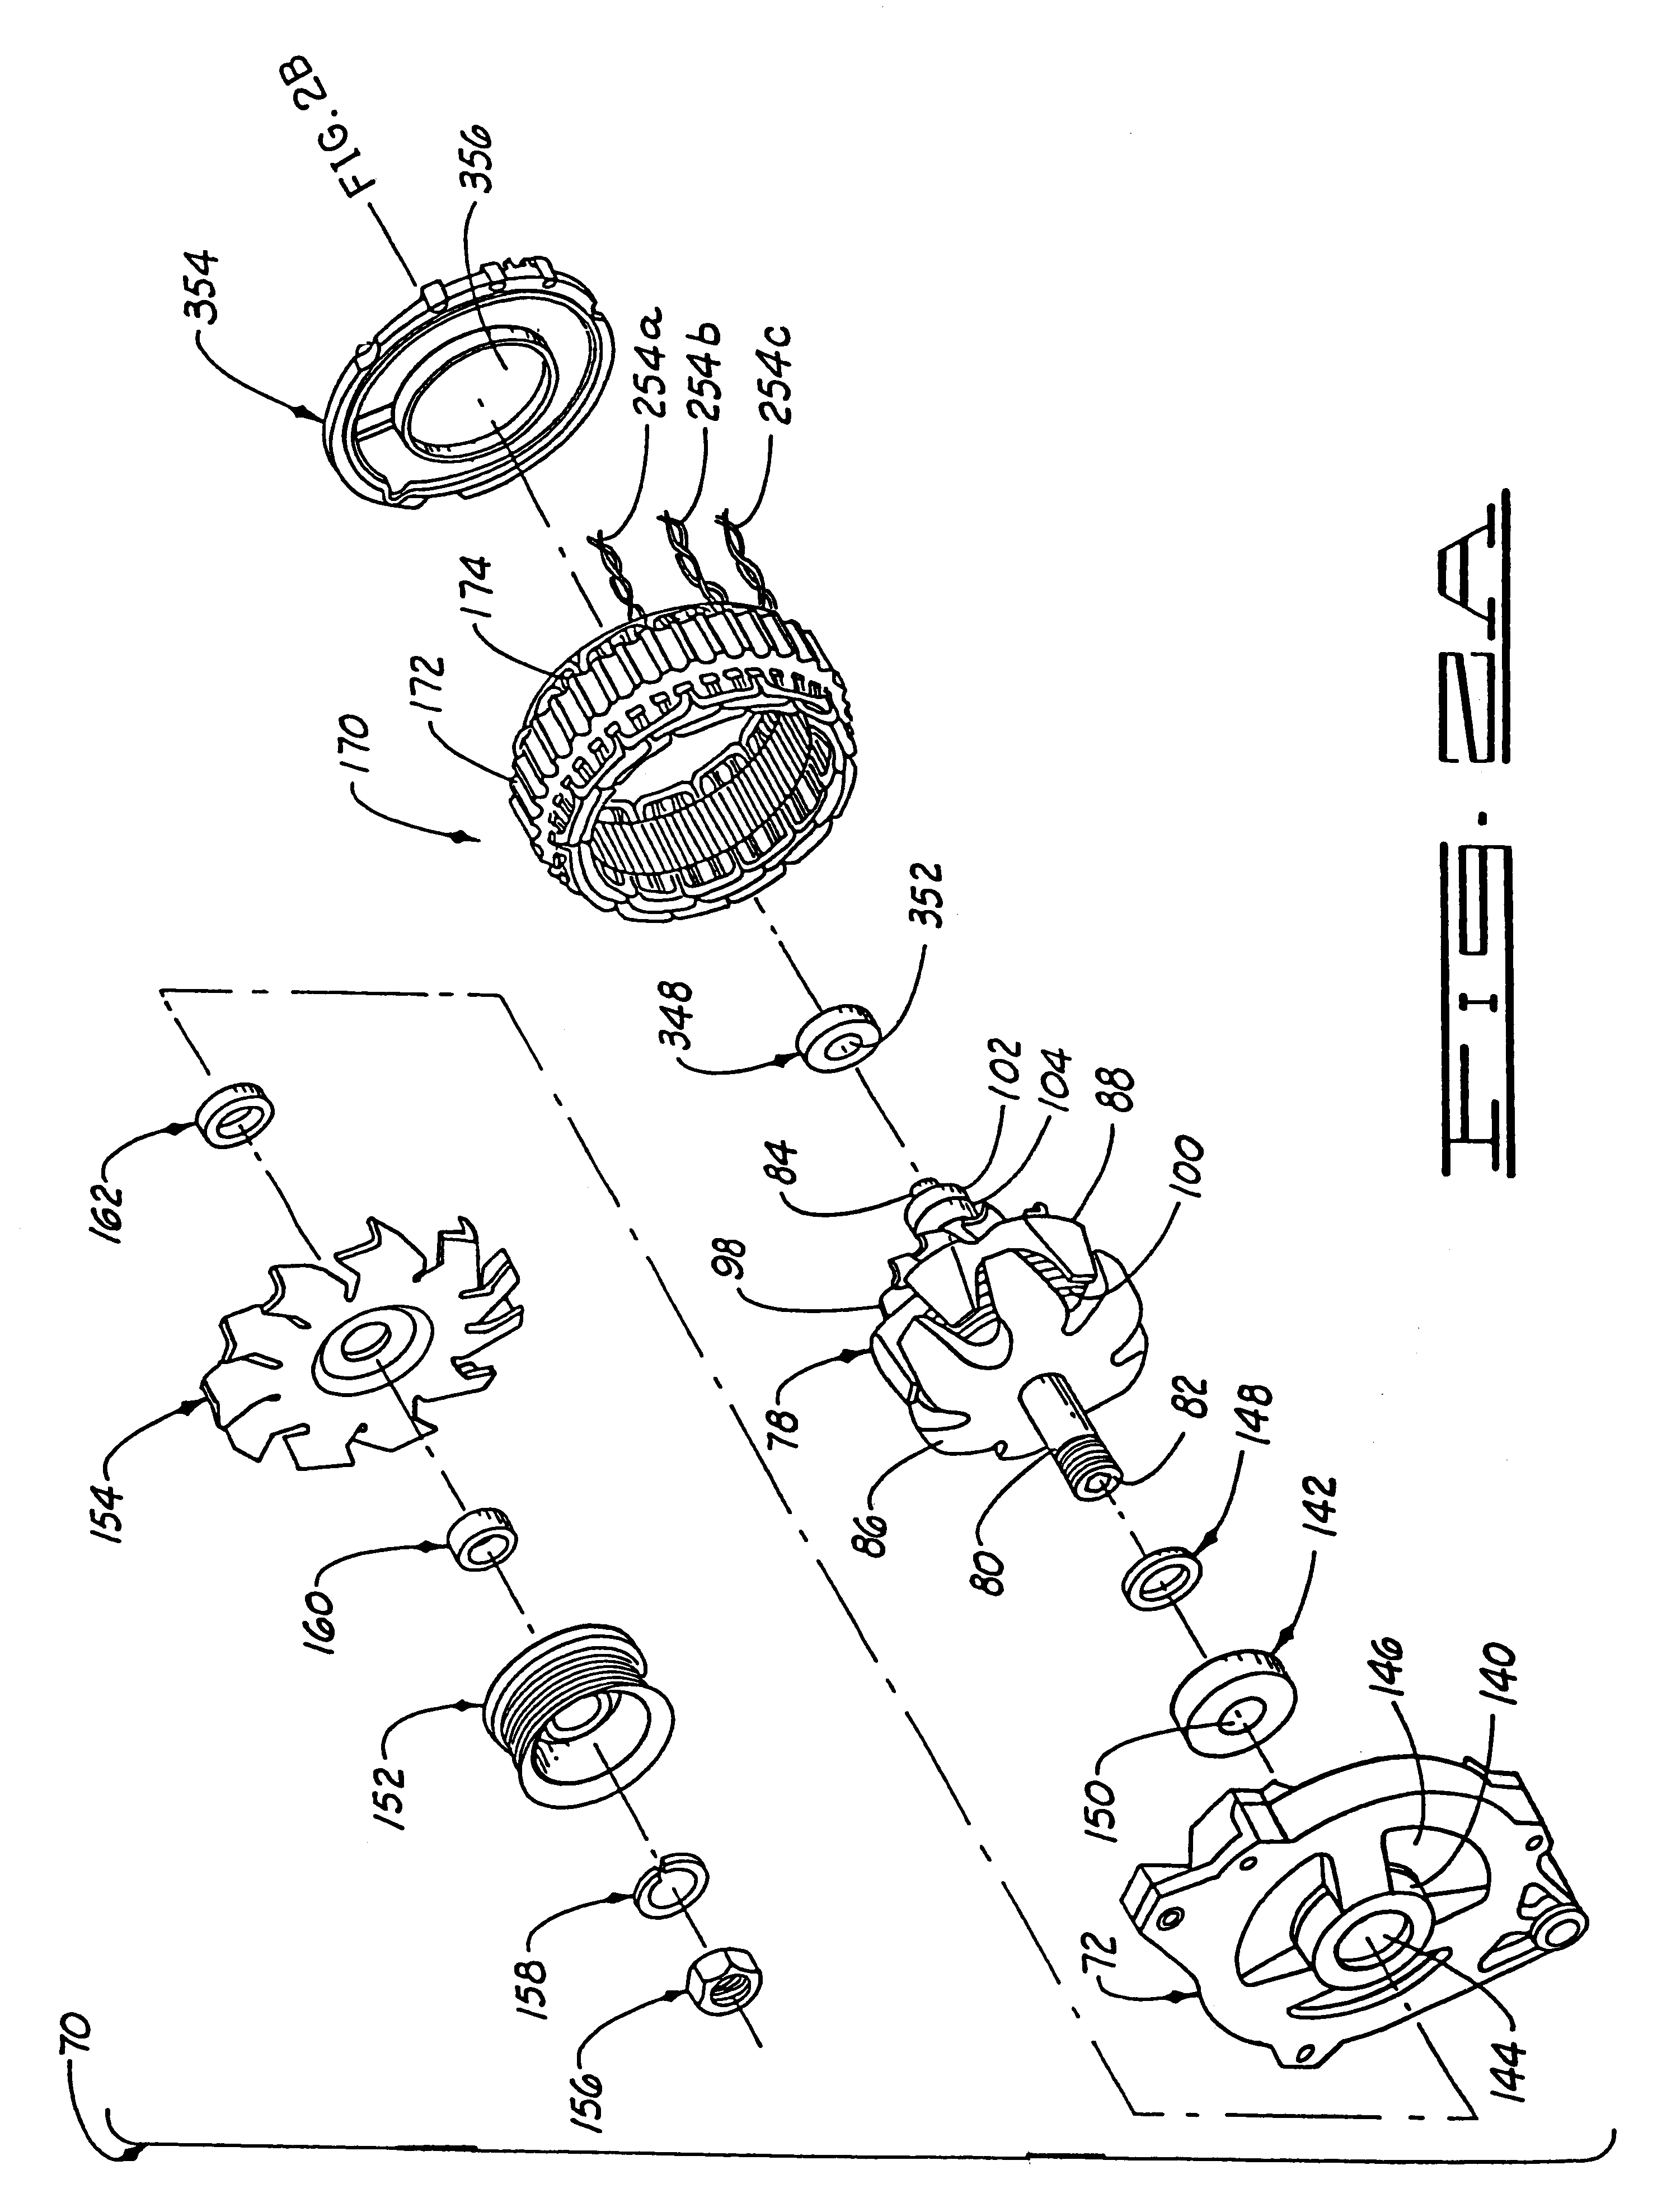 patent us6304012 - alternator